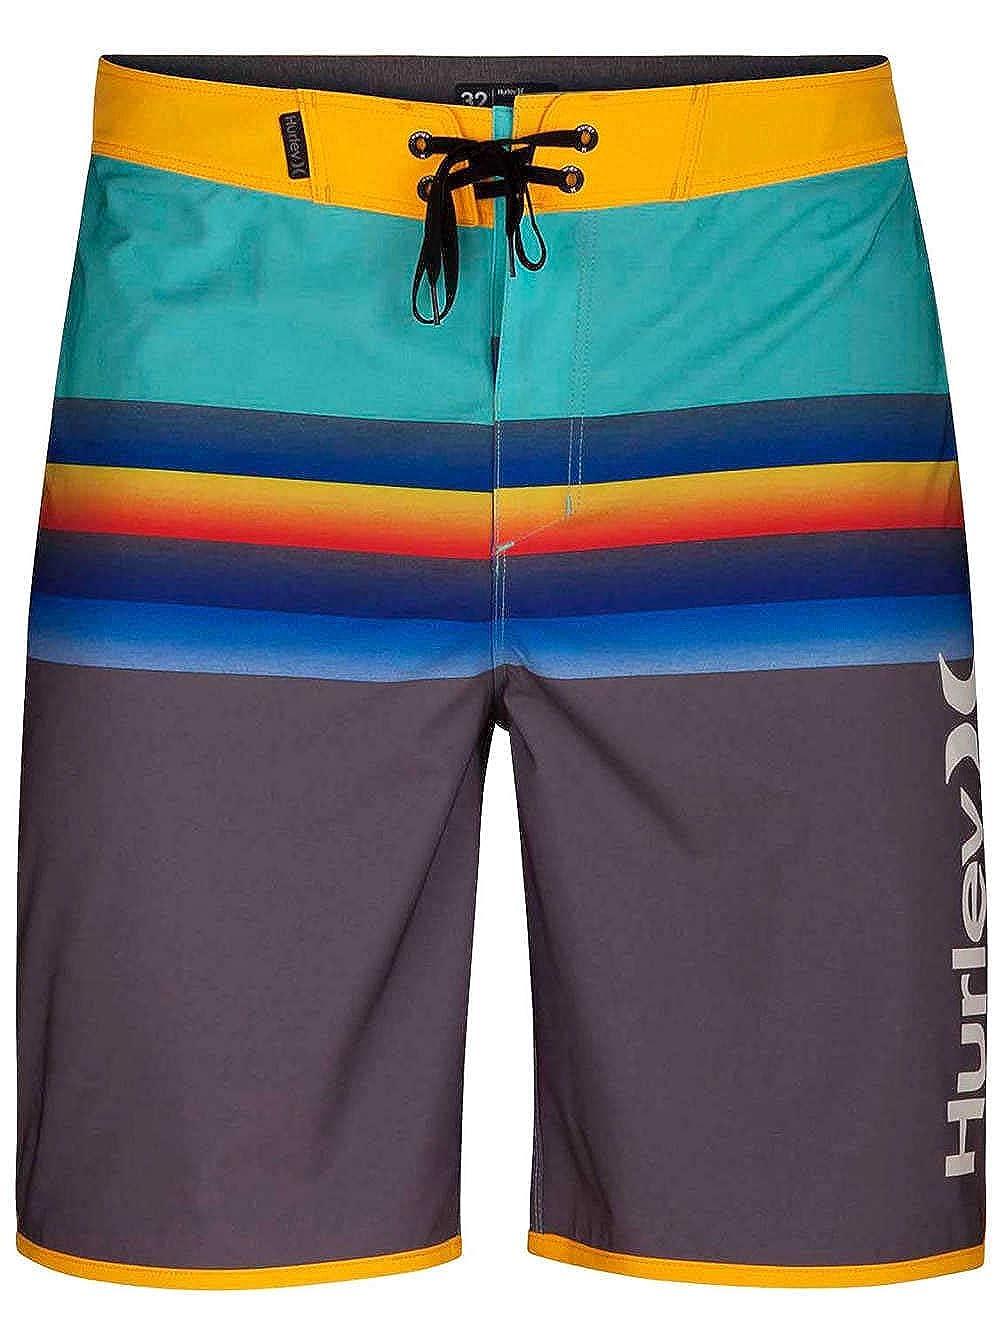 Hurley Mens Phantom Chill 20 Stretch Boardshorts